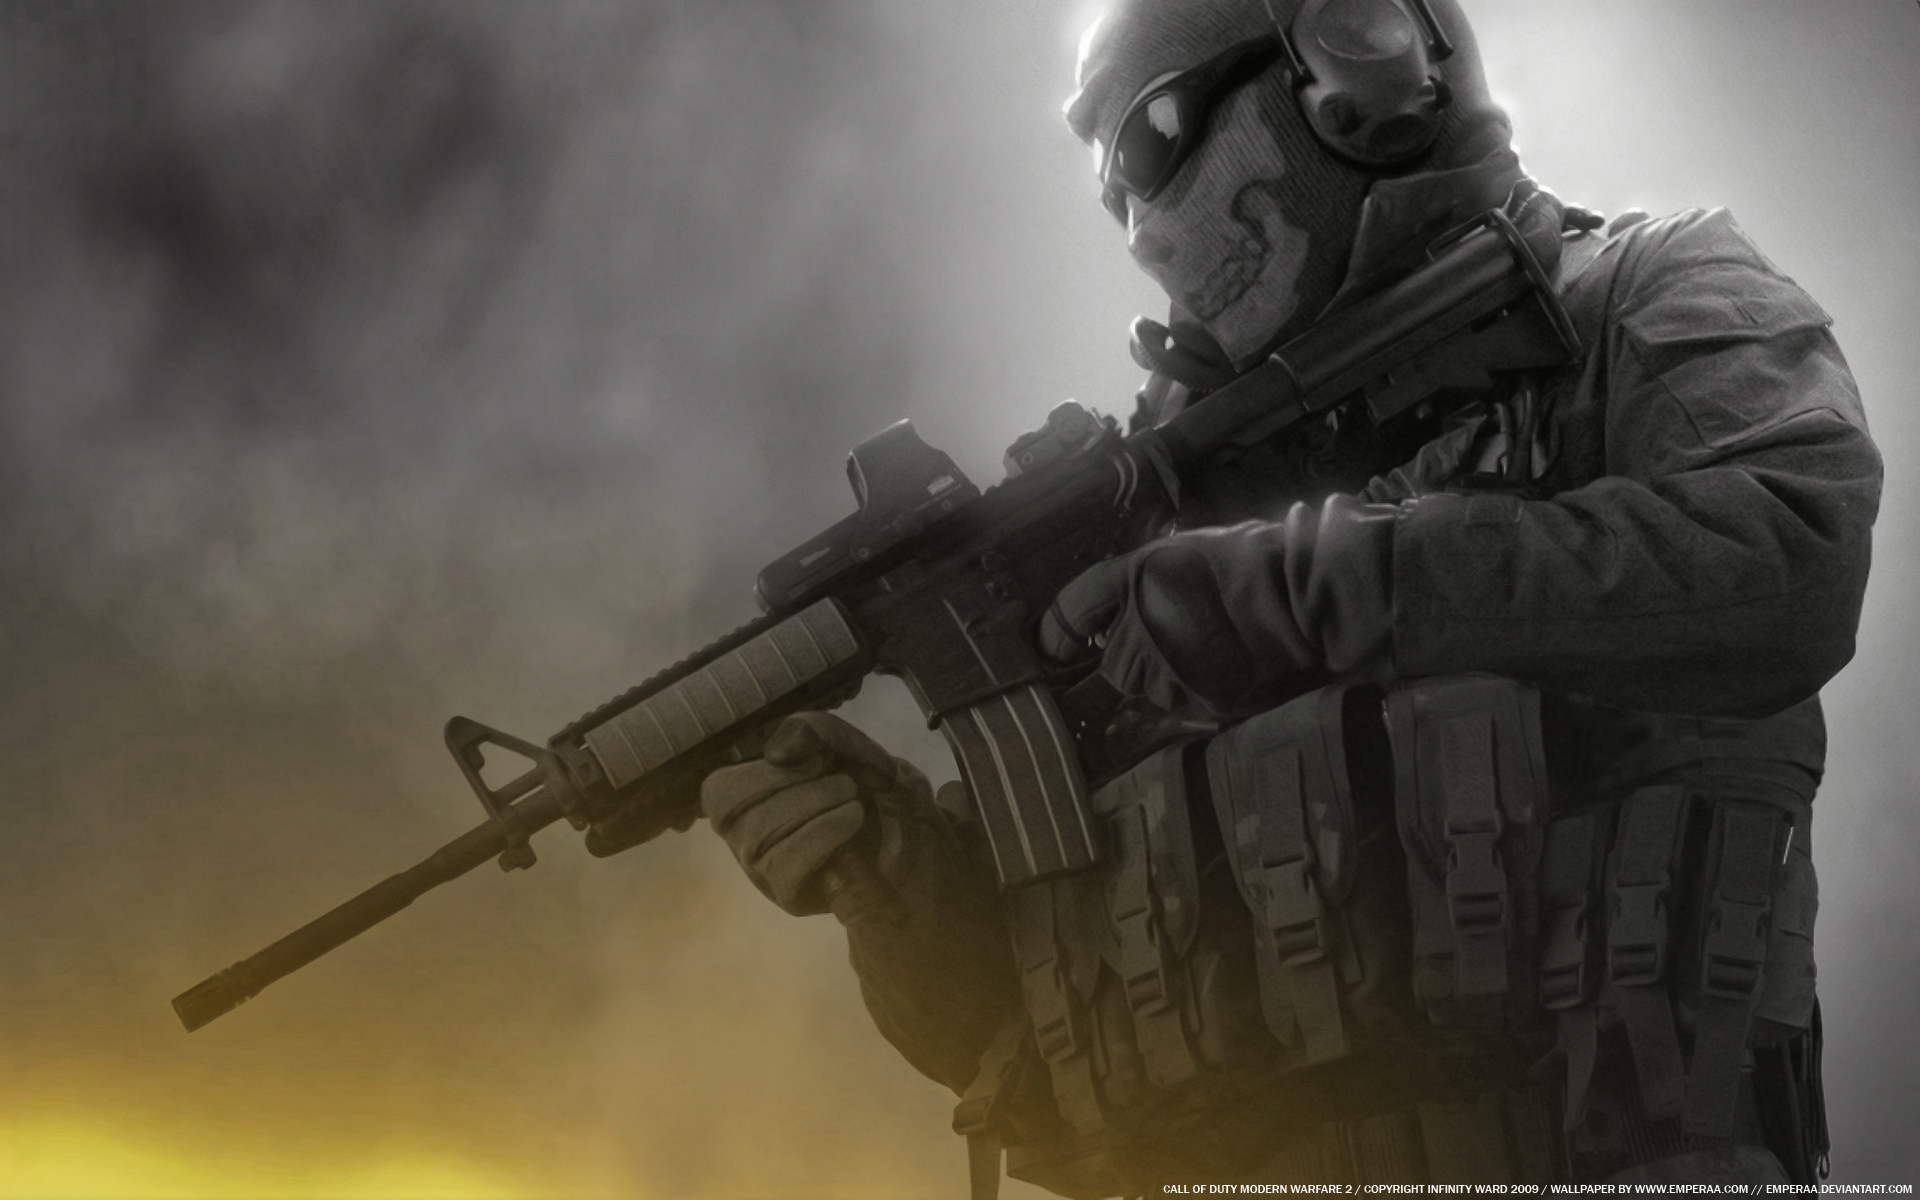 video games call of duty modern warfare ghosts 1920x1200 wallpaper 1920x1200